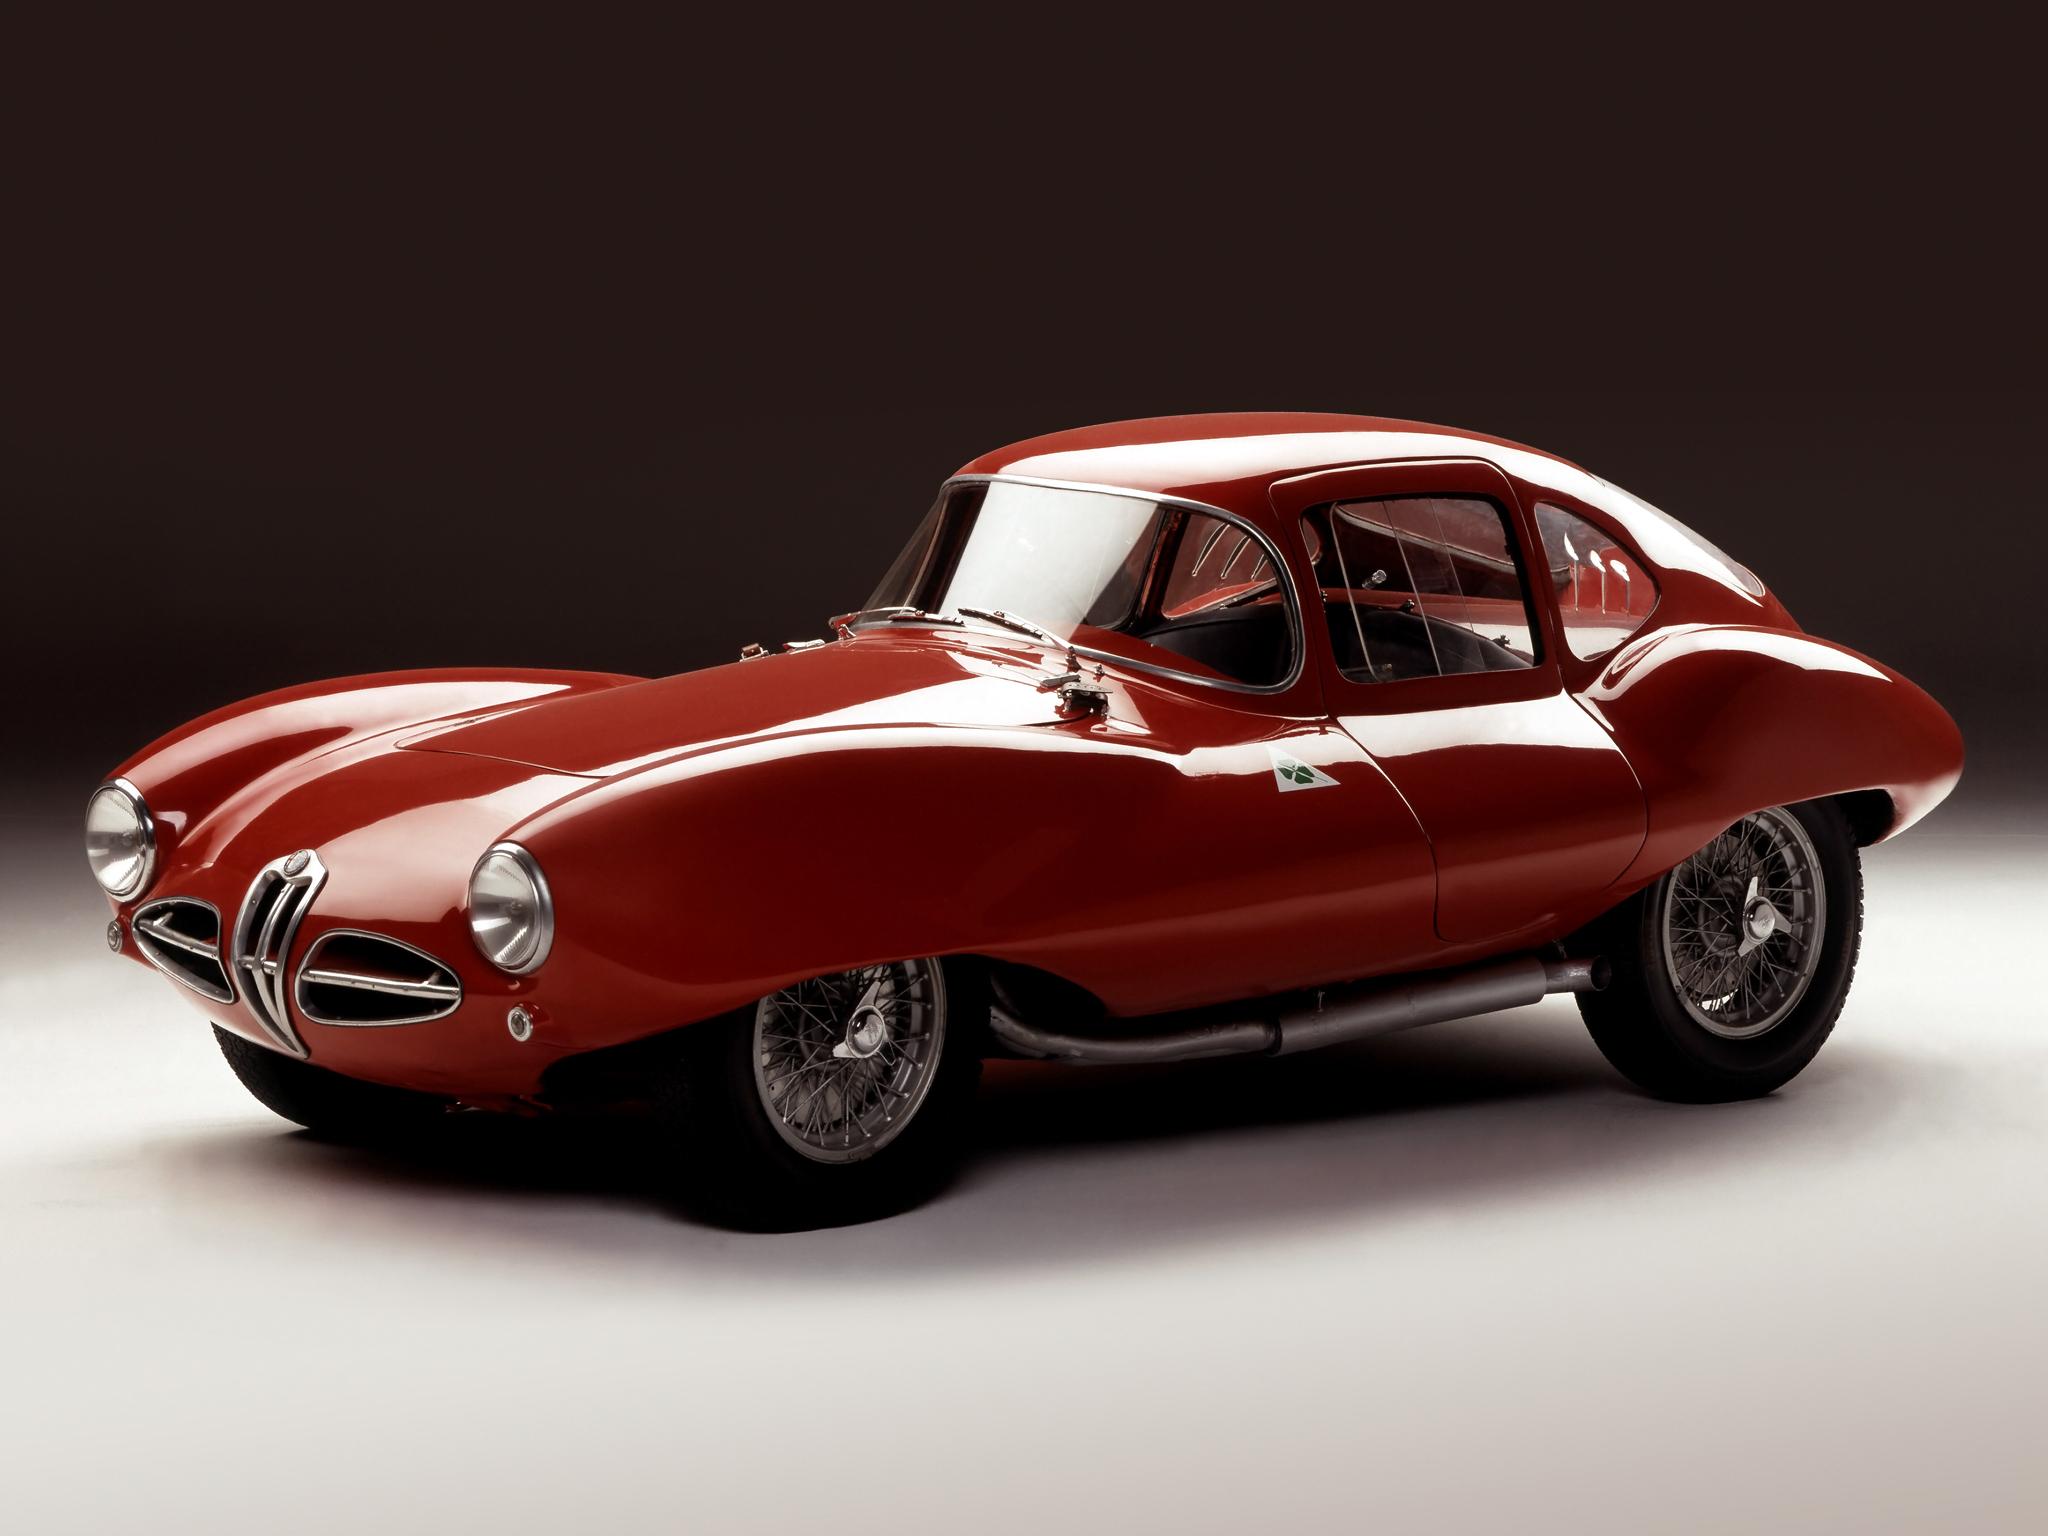 Alfa Romeo Disco Volante >> Alfa Romeo 1900 C52 Disco Volante Coupe 1359 1953 Hd Duvar Kagidi